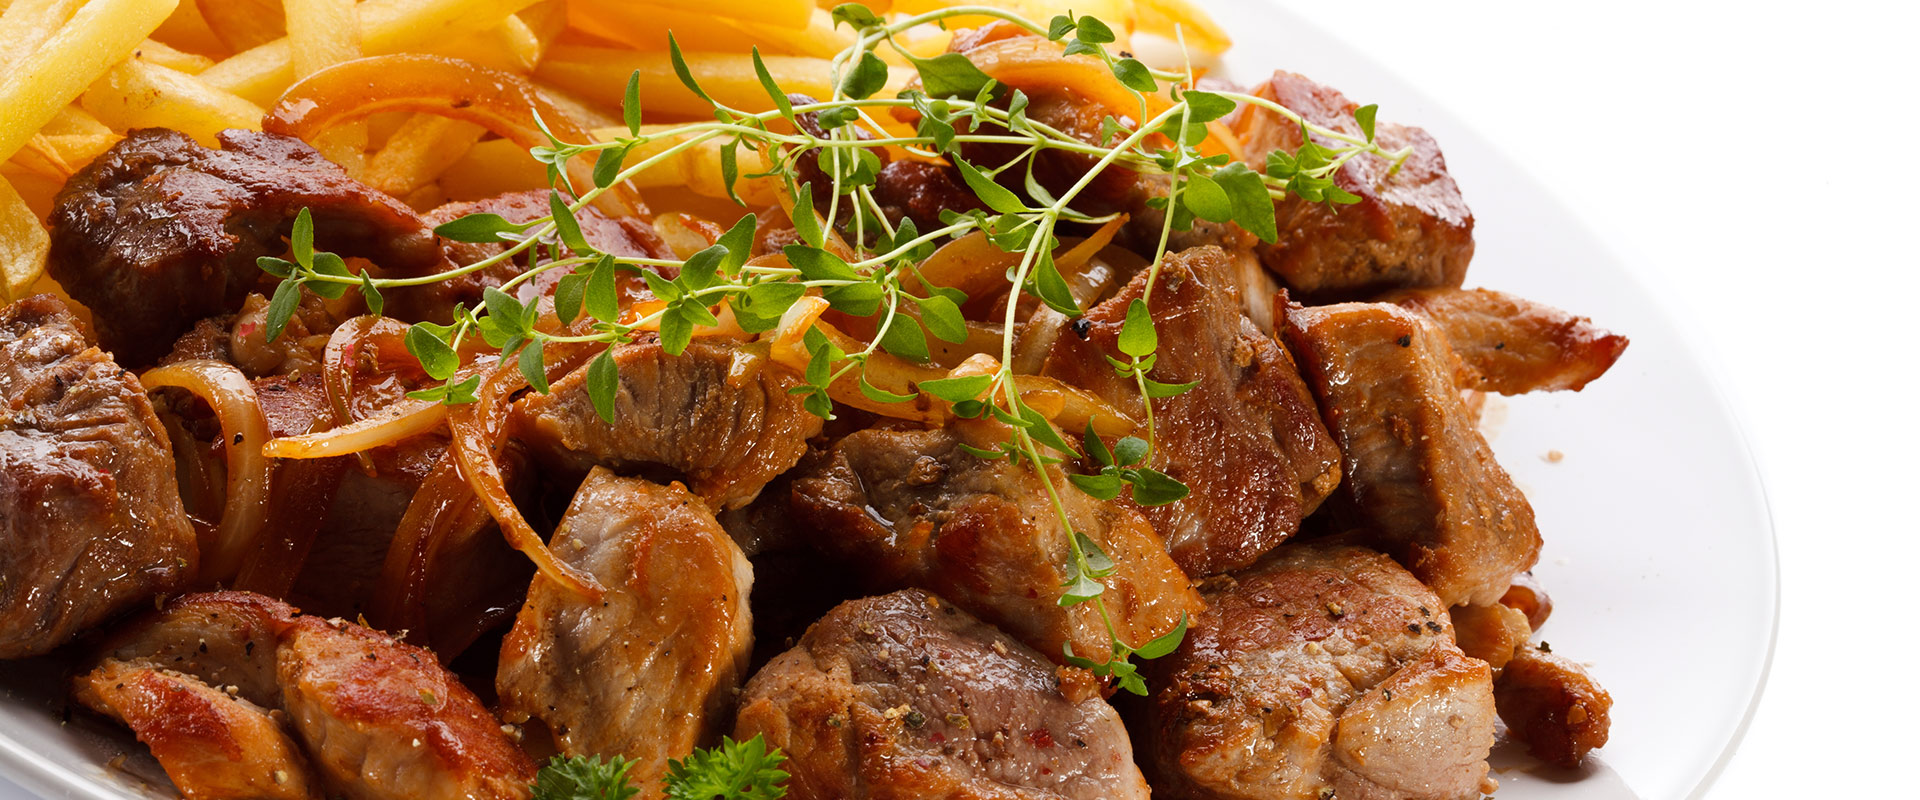 Order Food Delivery Online From Local Restaurants Orangecrate